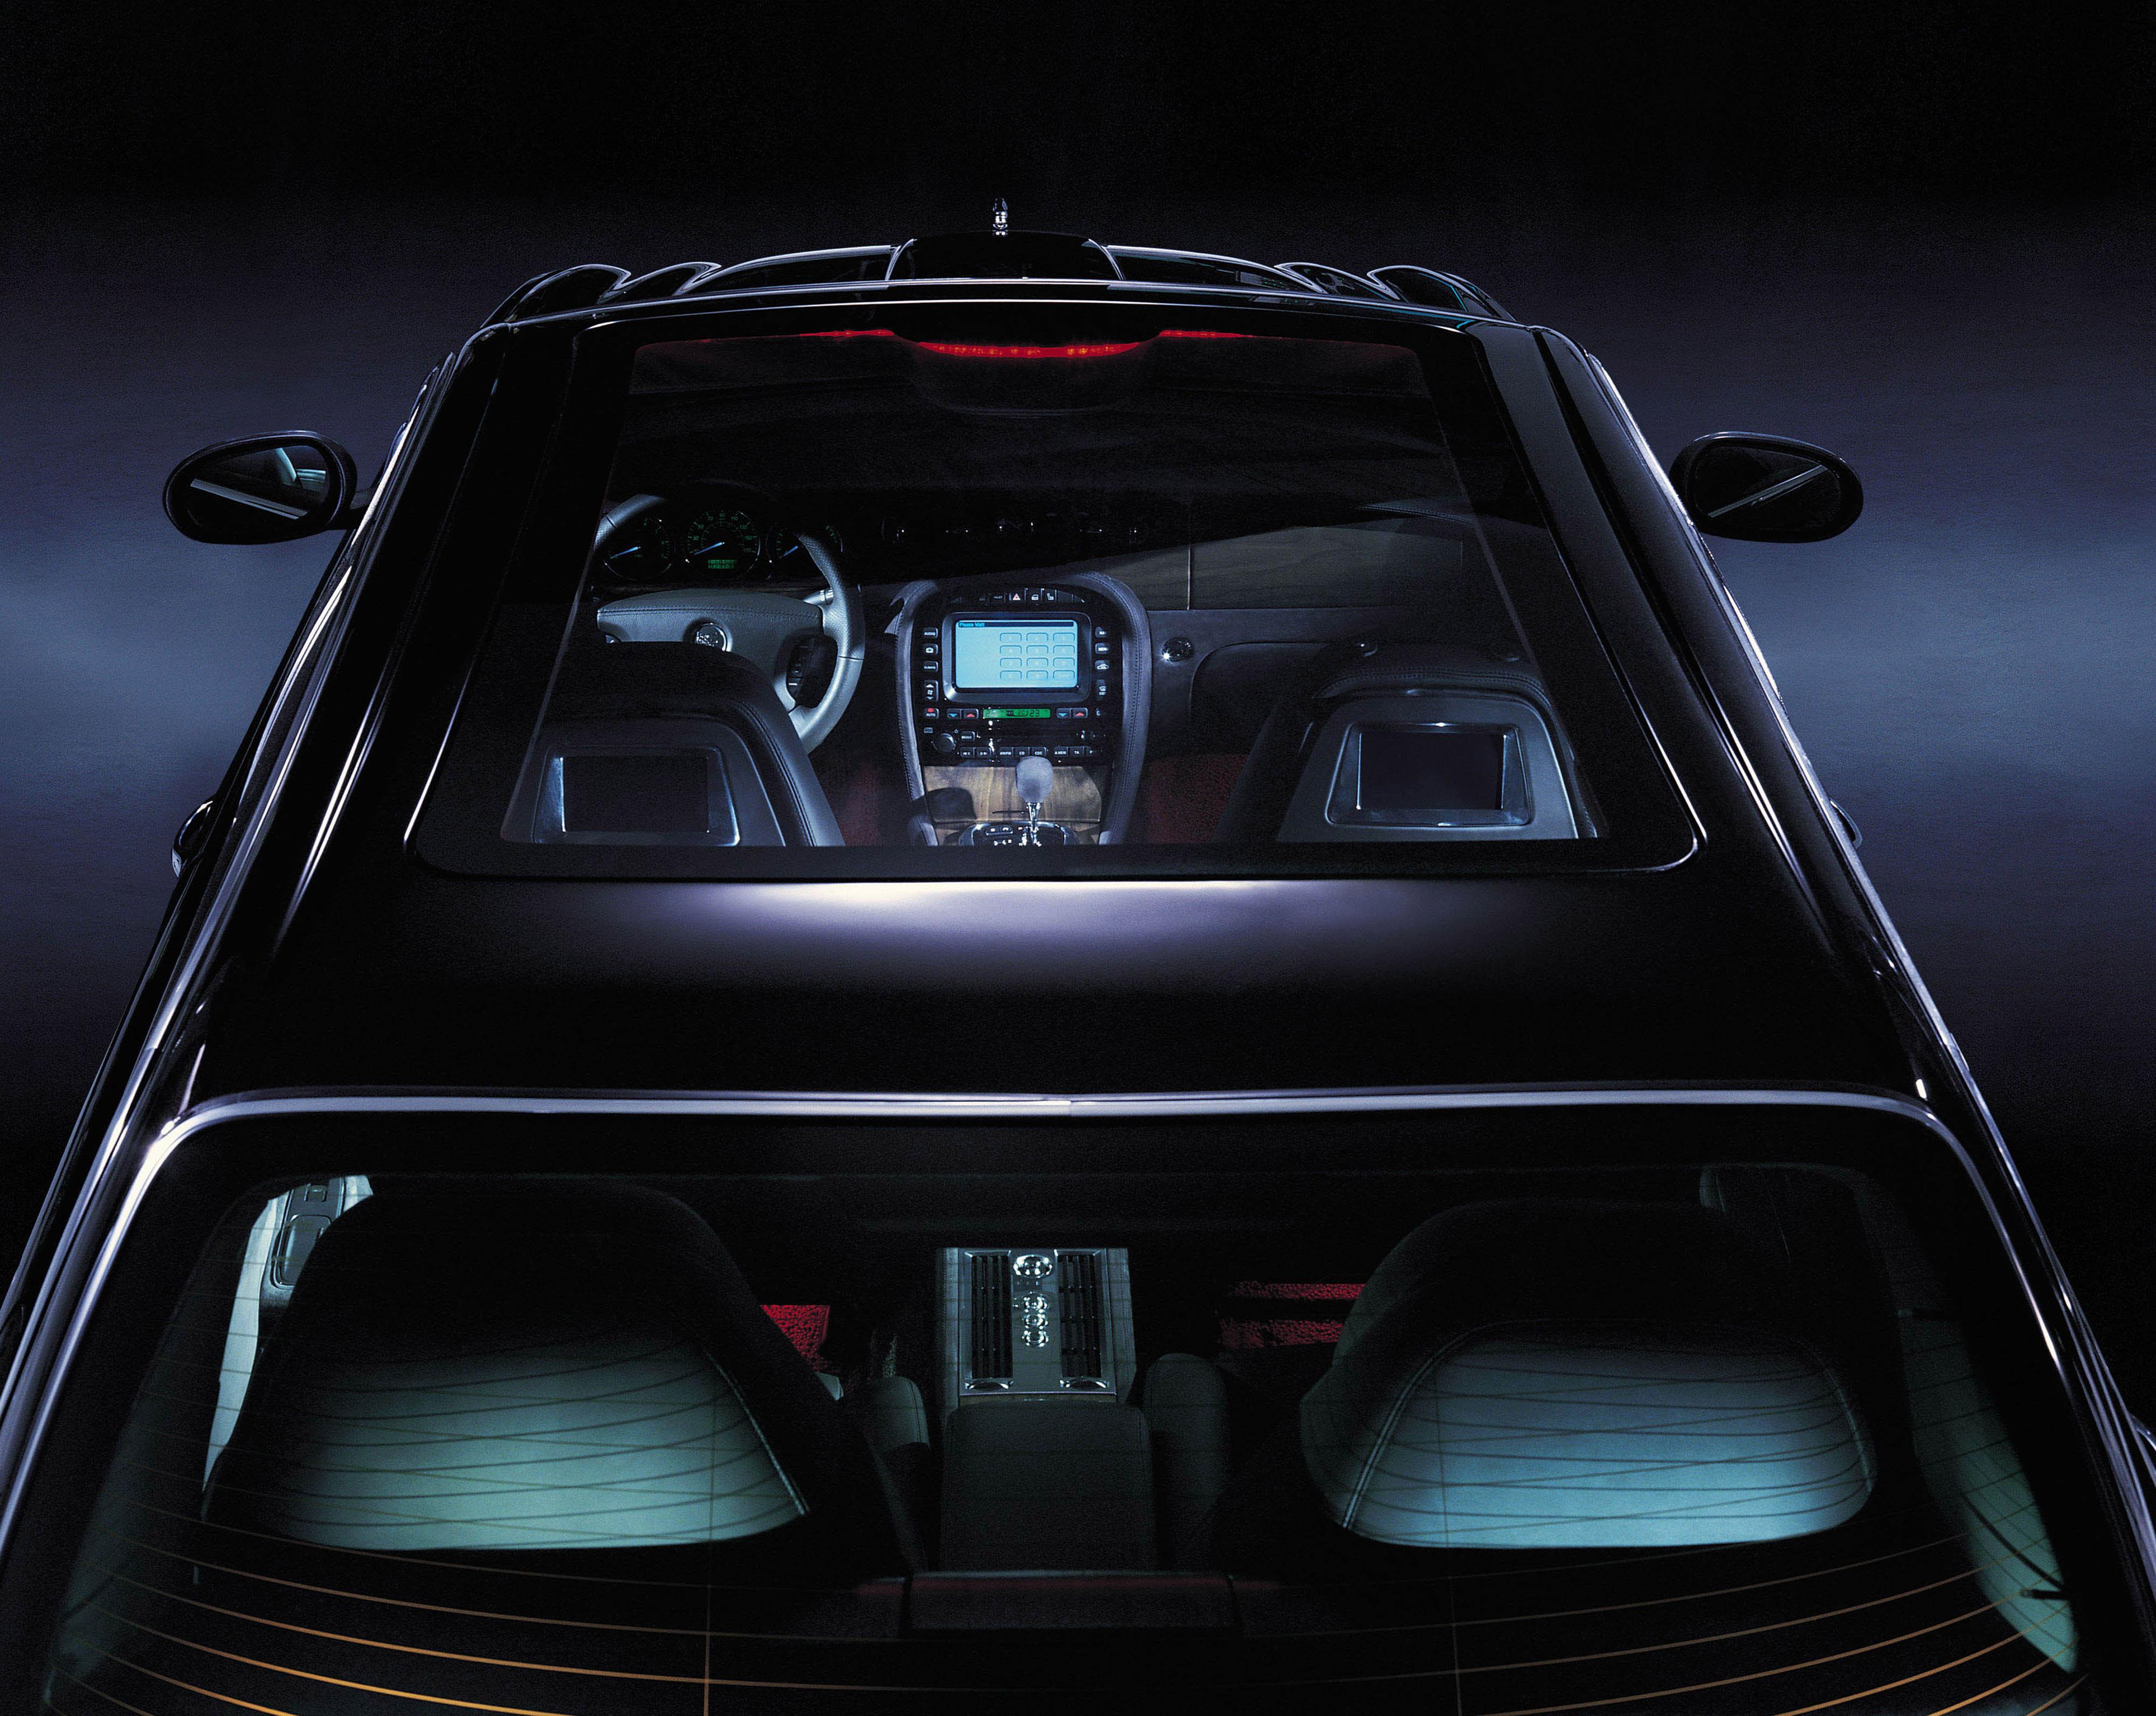 2014 Vm Motori Ecodiesel V6 Engine   Autos Post